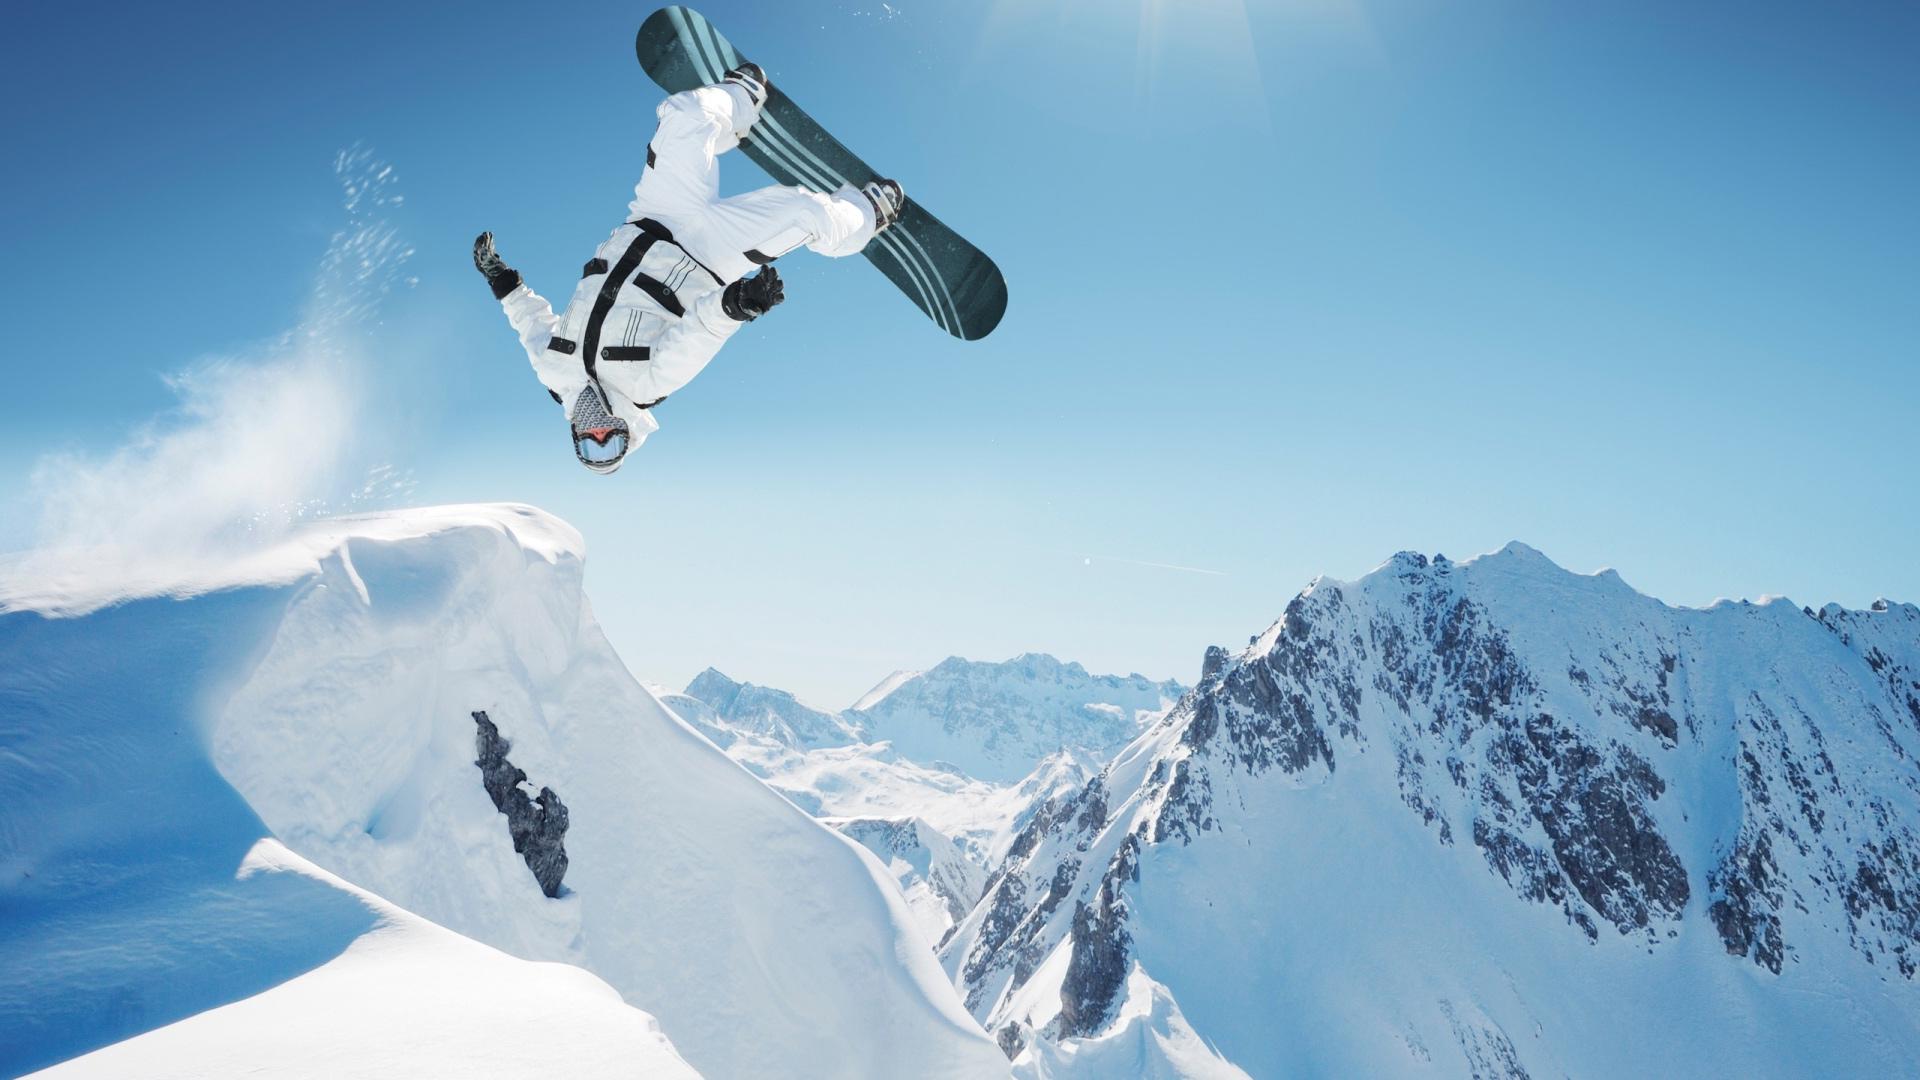 Картинки по запросу сноубордиста